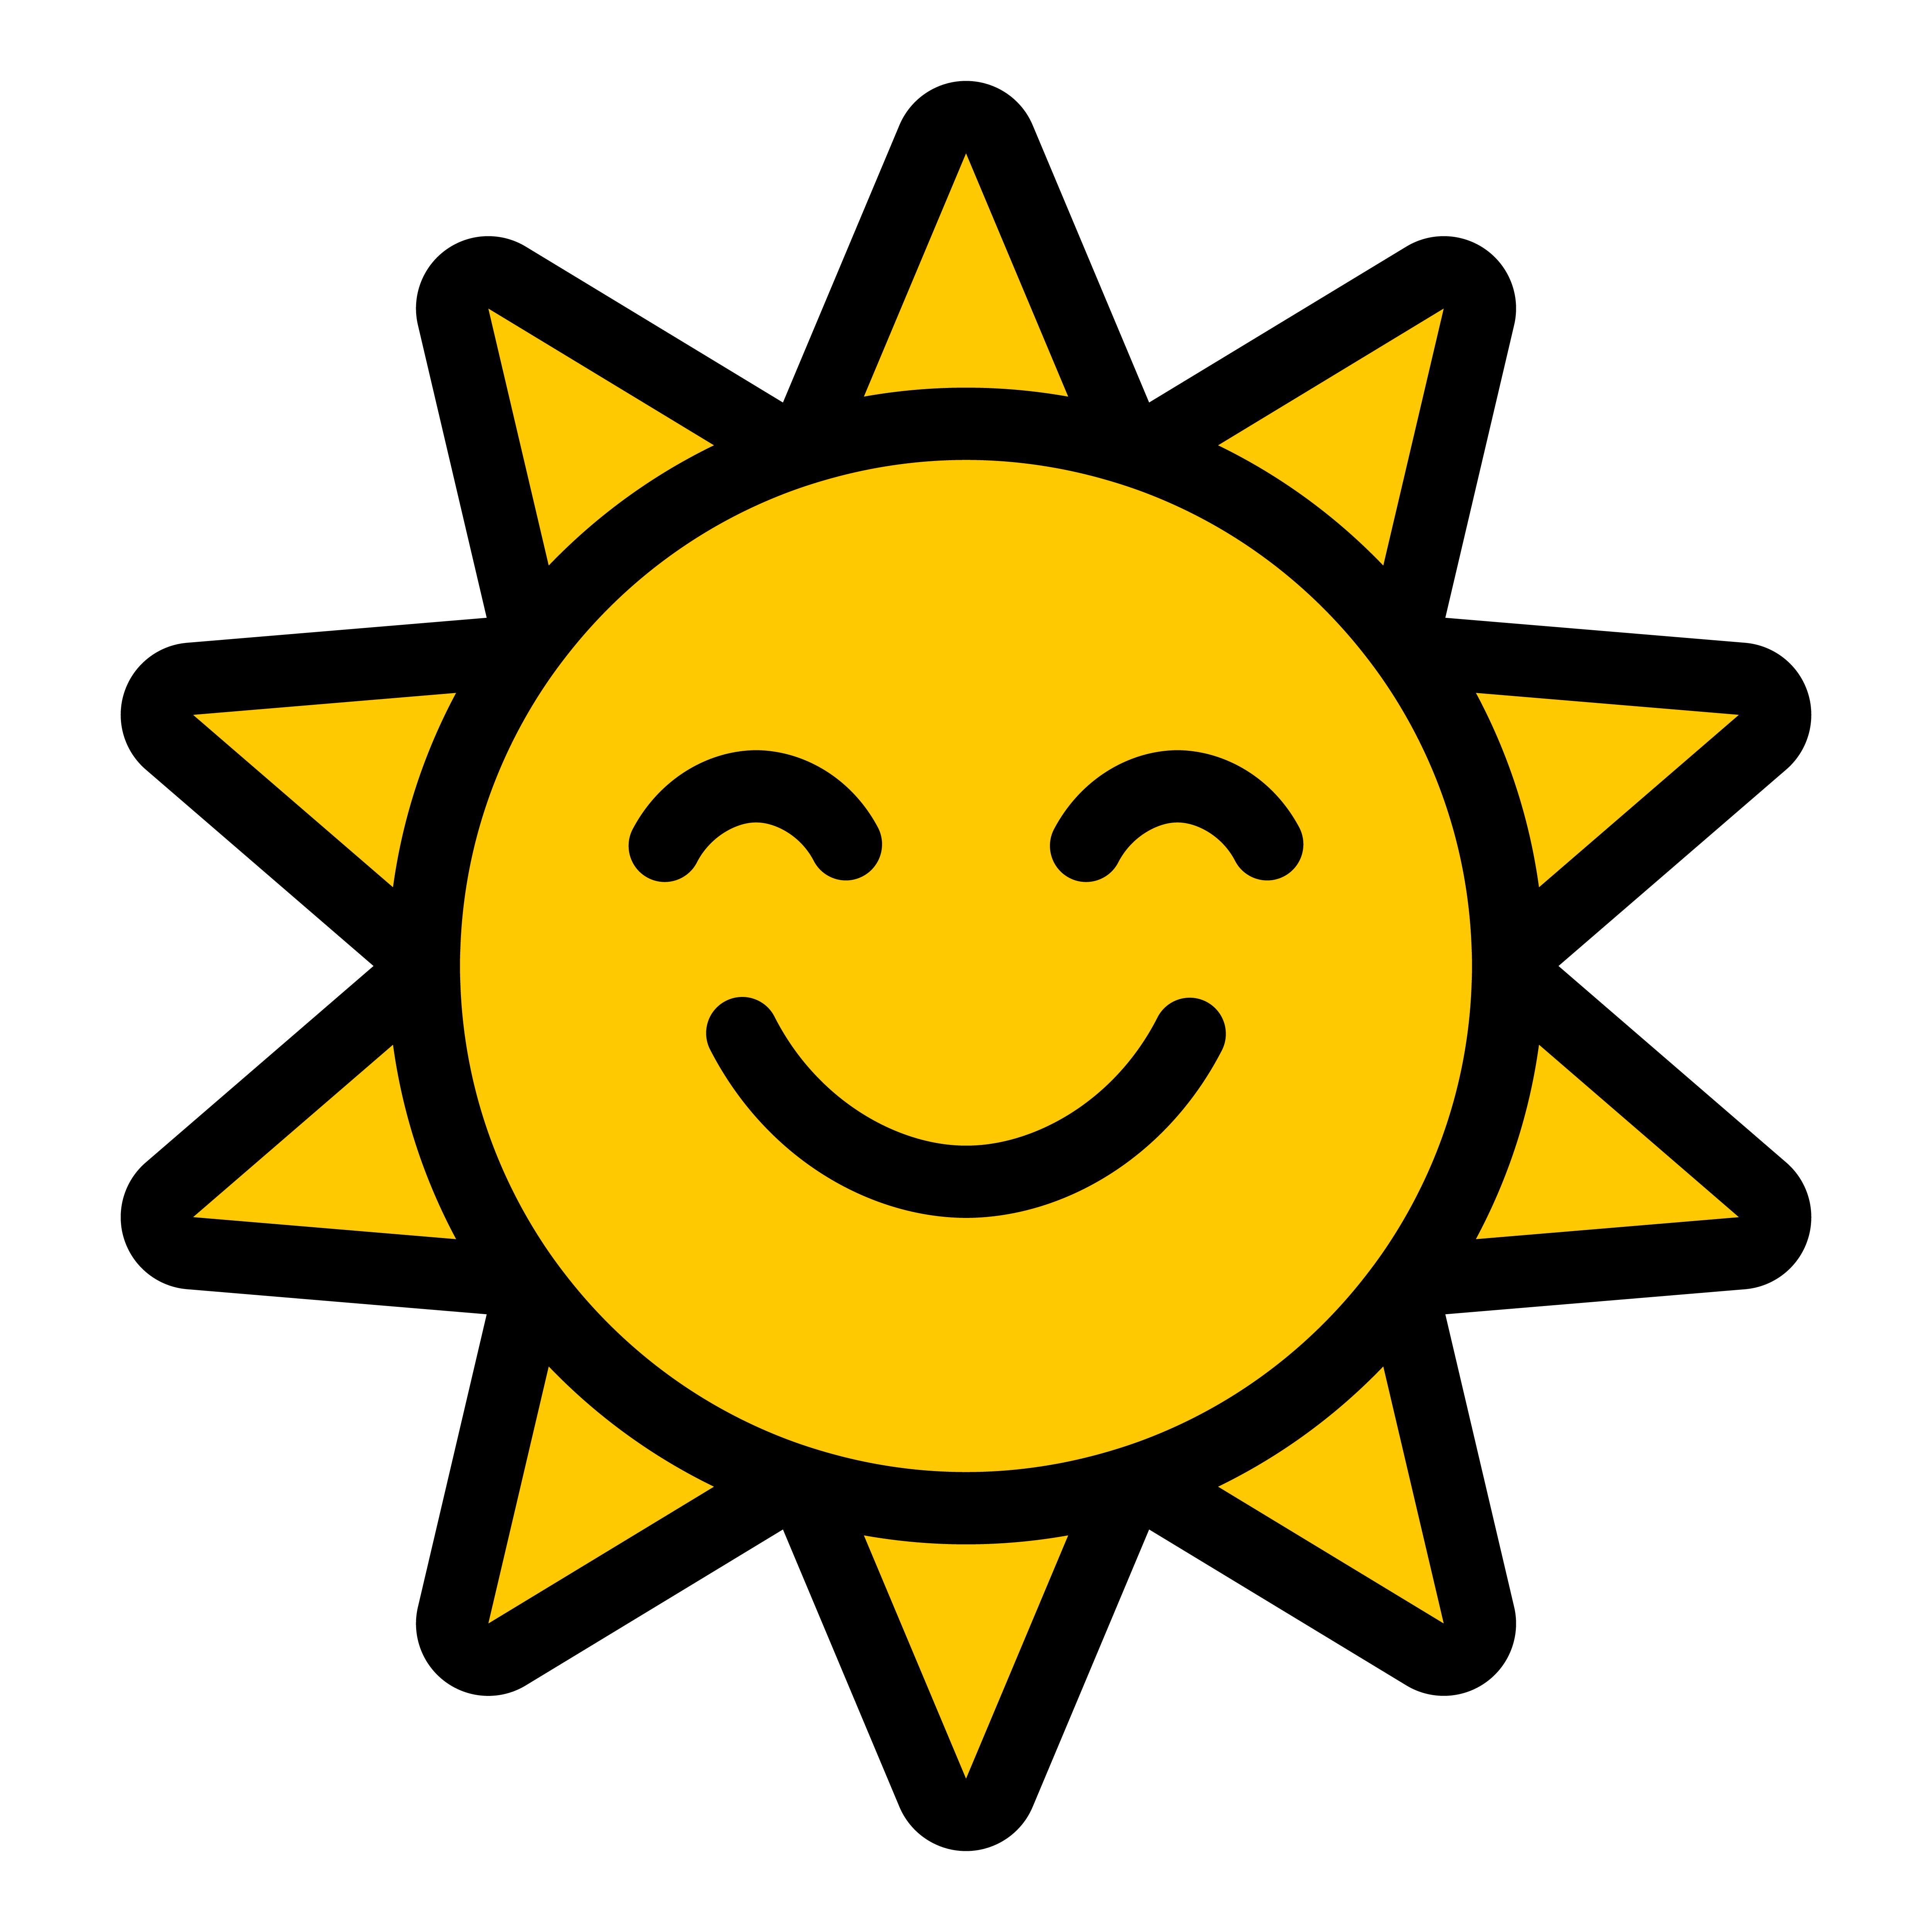 https://static.vecteezy.com/system/resources/previews/000/551/099/original/cartoon-sun-vector.jpg